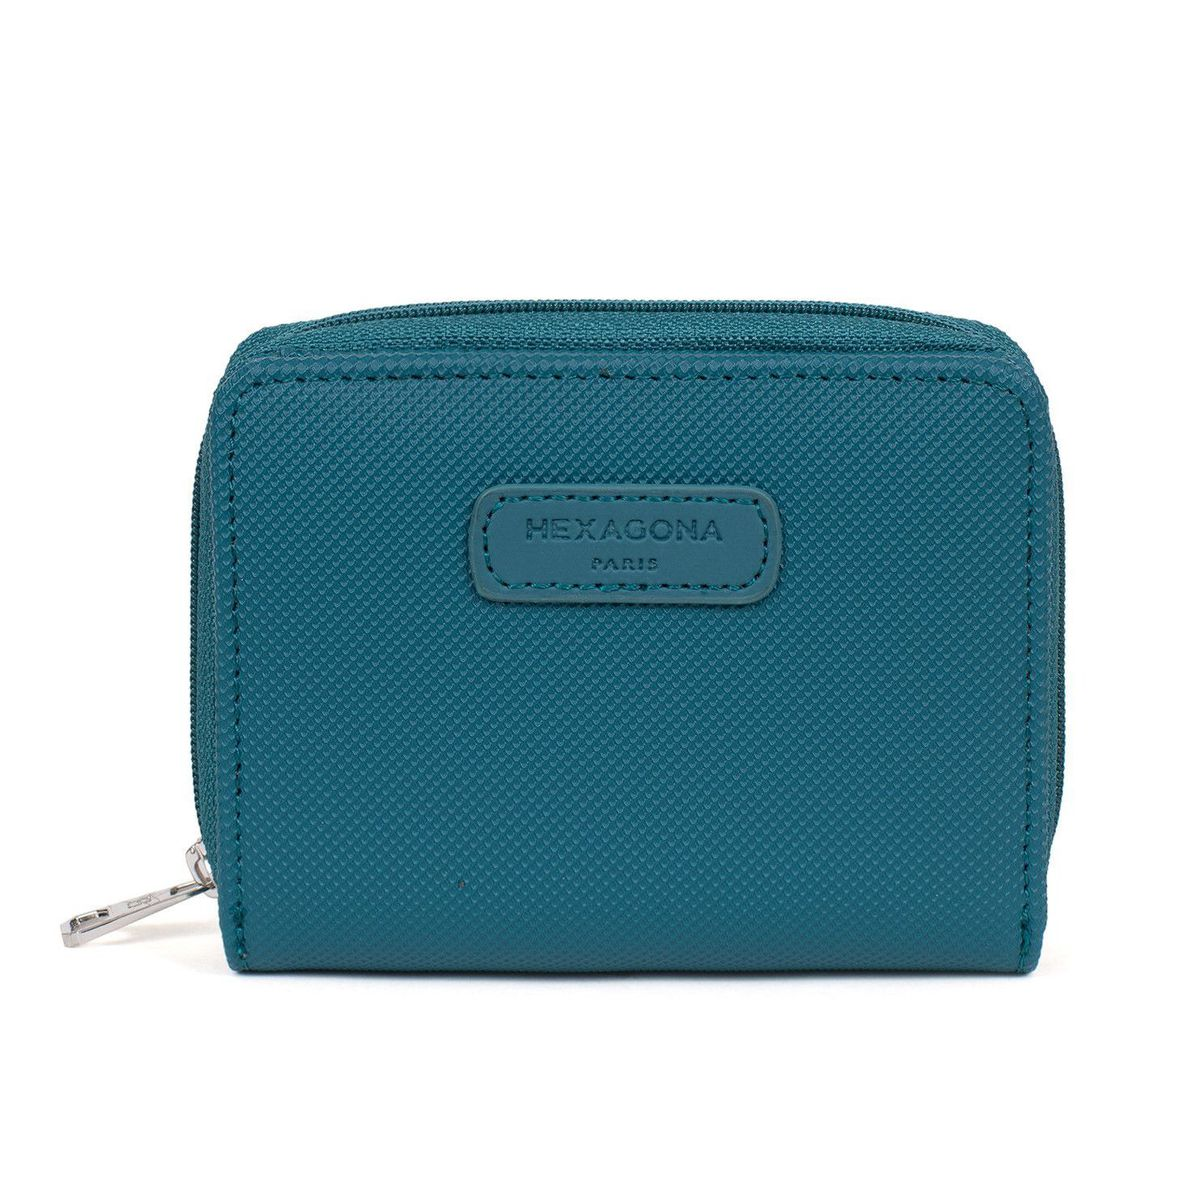 1. Double compartment women's wallet Blue petrol Hexagona